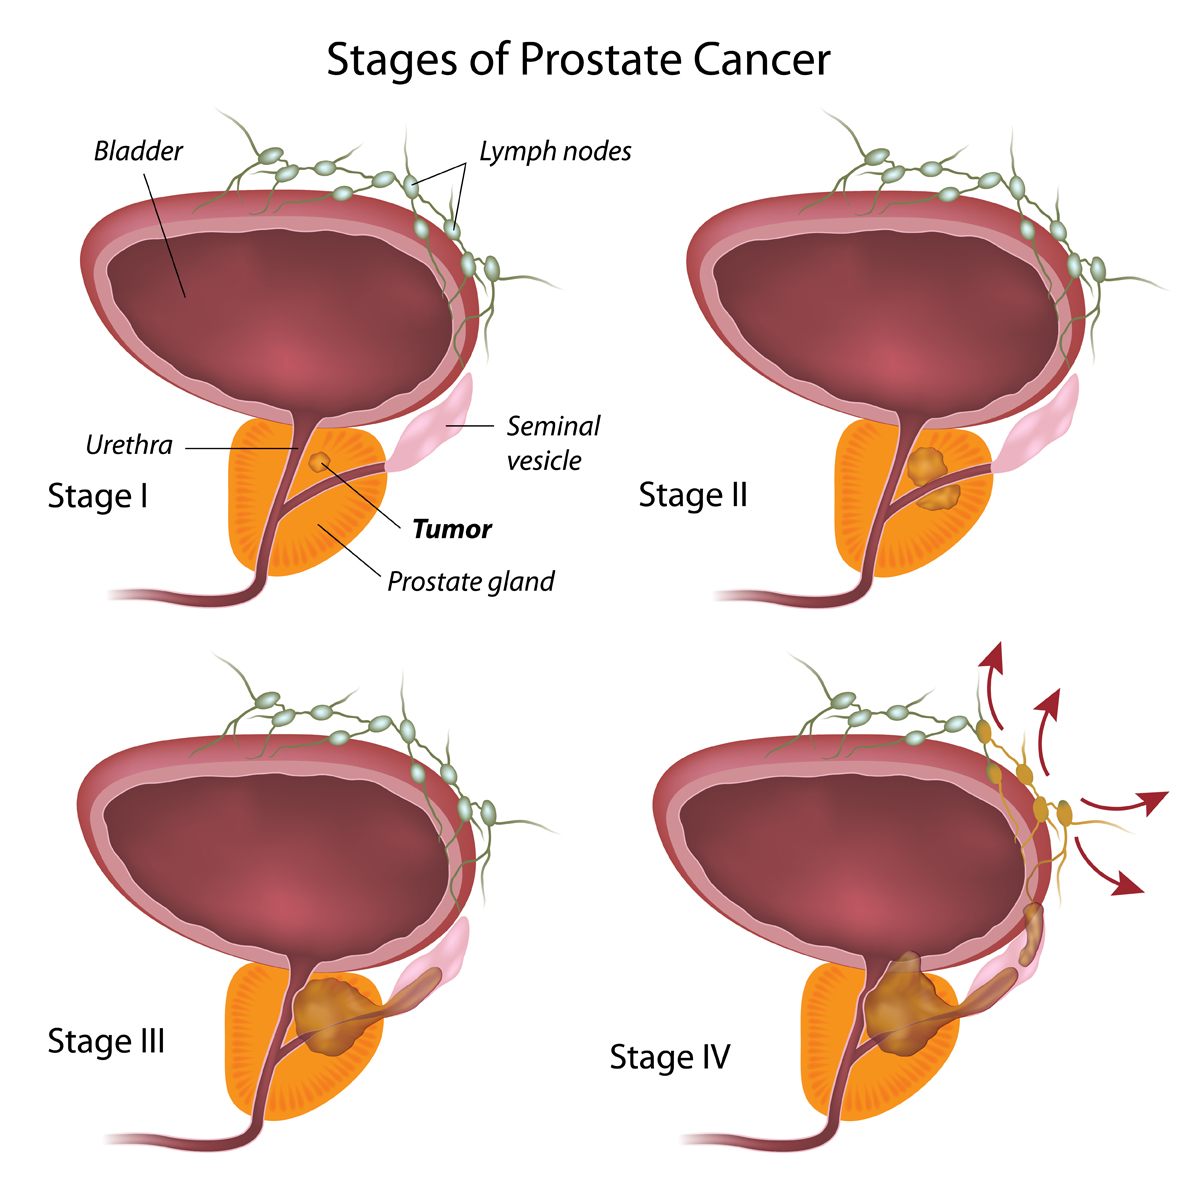 la tumpre de próstata cura en pavianna